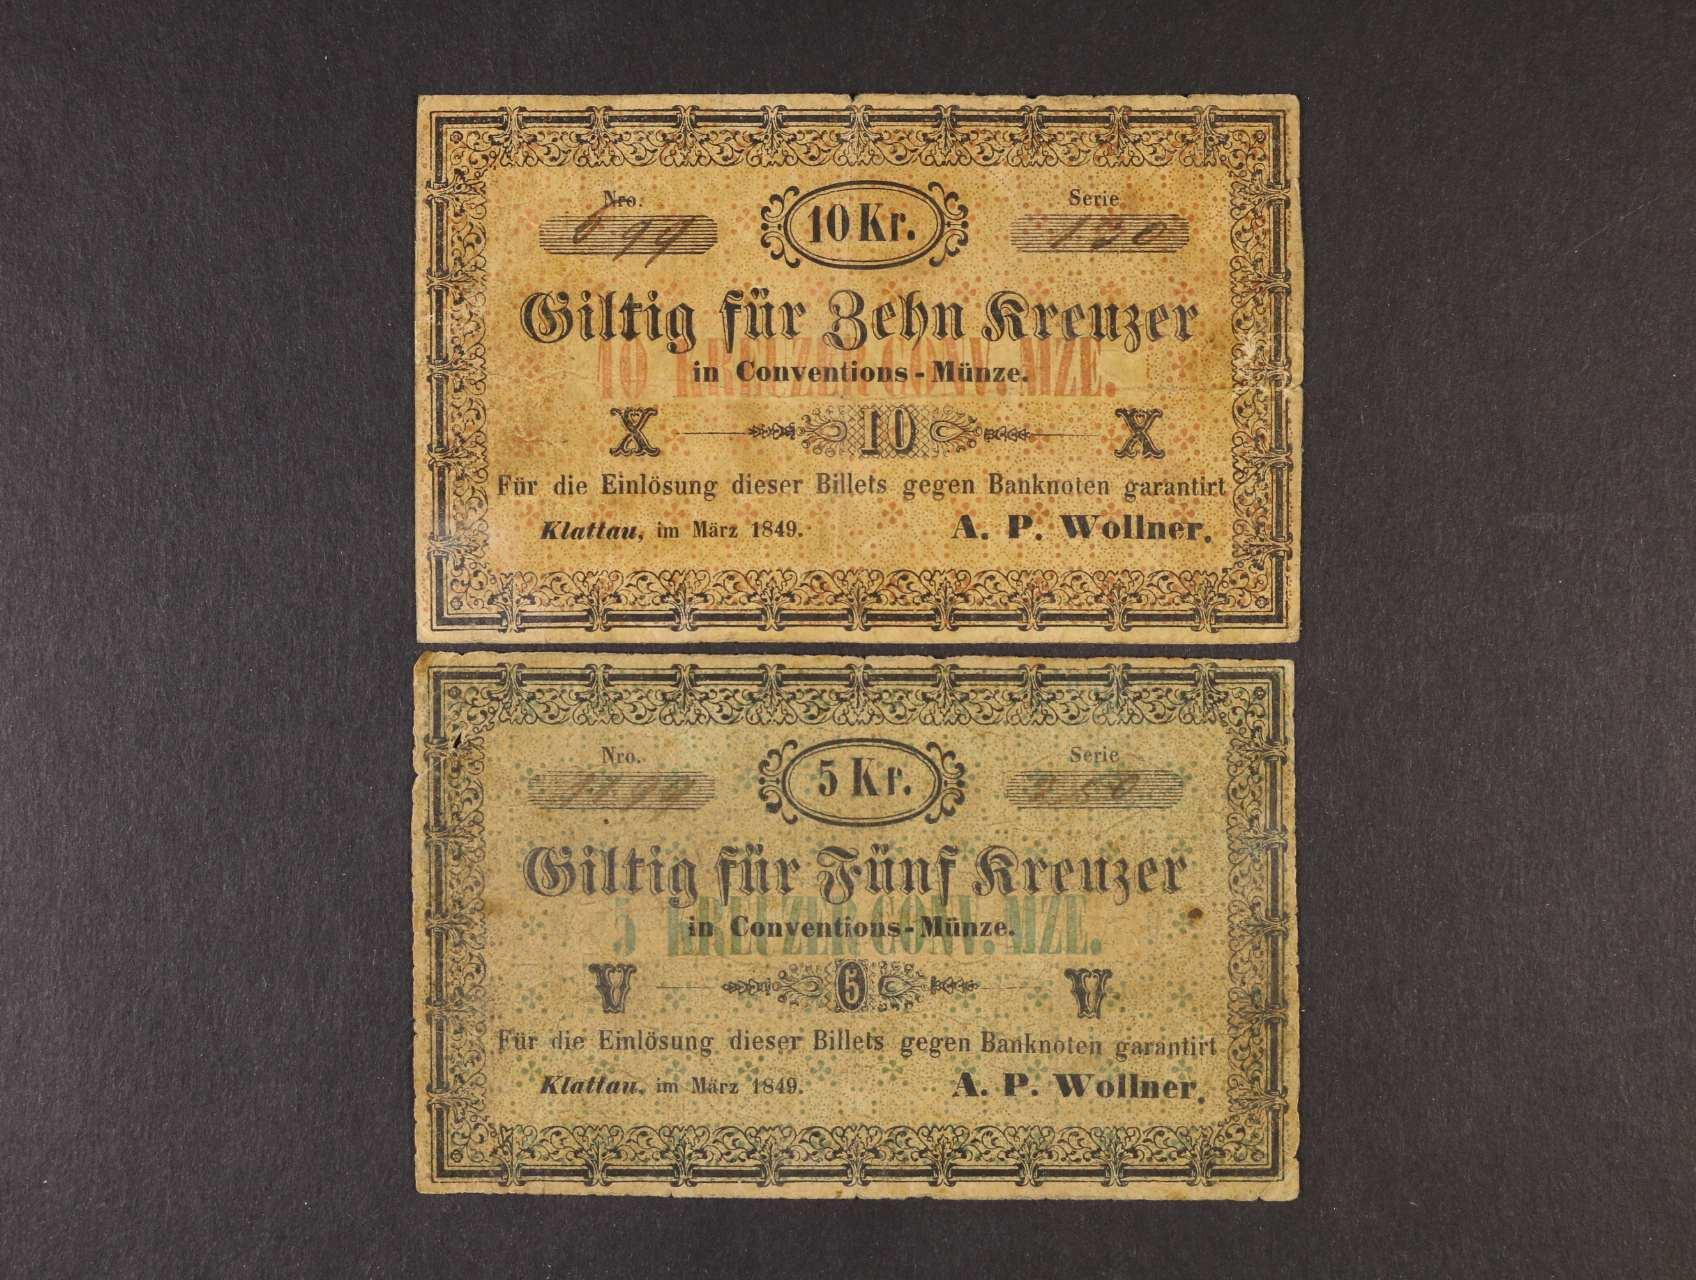 Klattau (Klatovy), 5, 10 kr. C.M. III.1849 A.P.Wollner, V.R. 620.04.02, 03